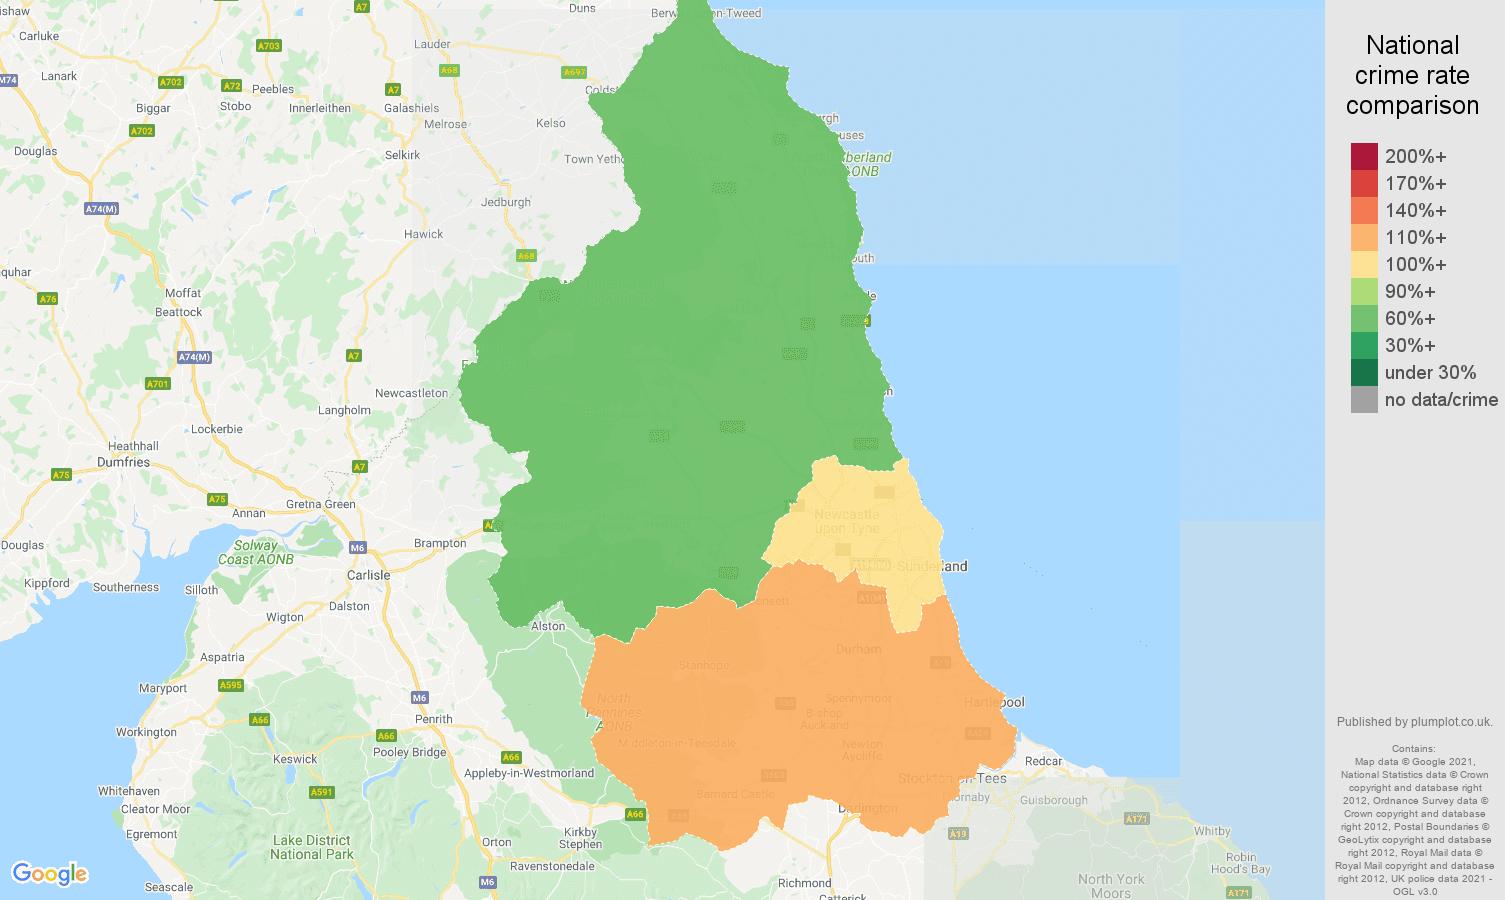 North East burglary crime rate comparison map